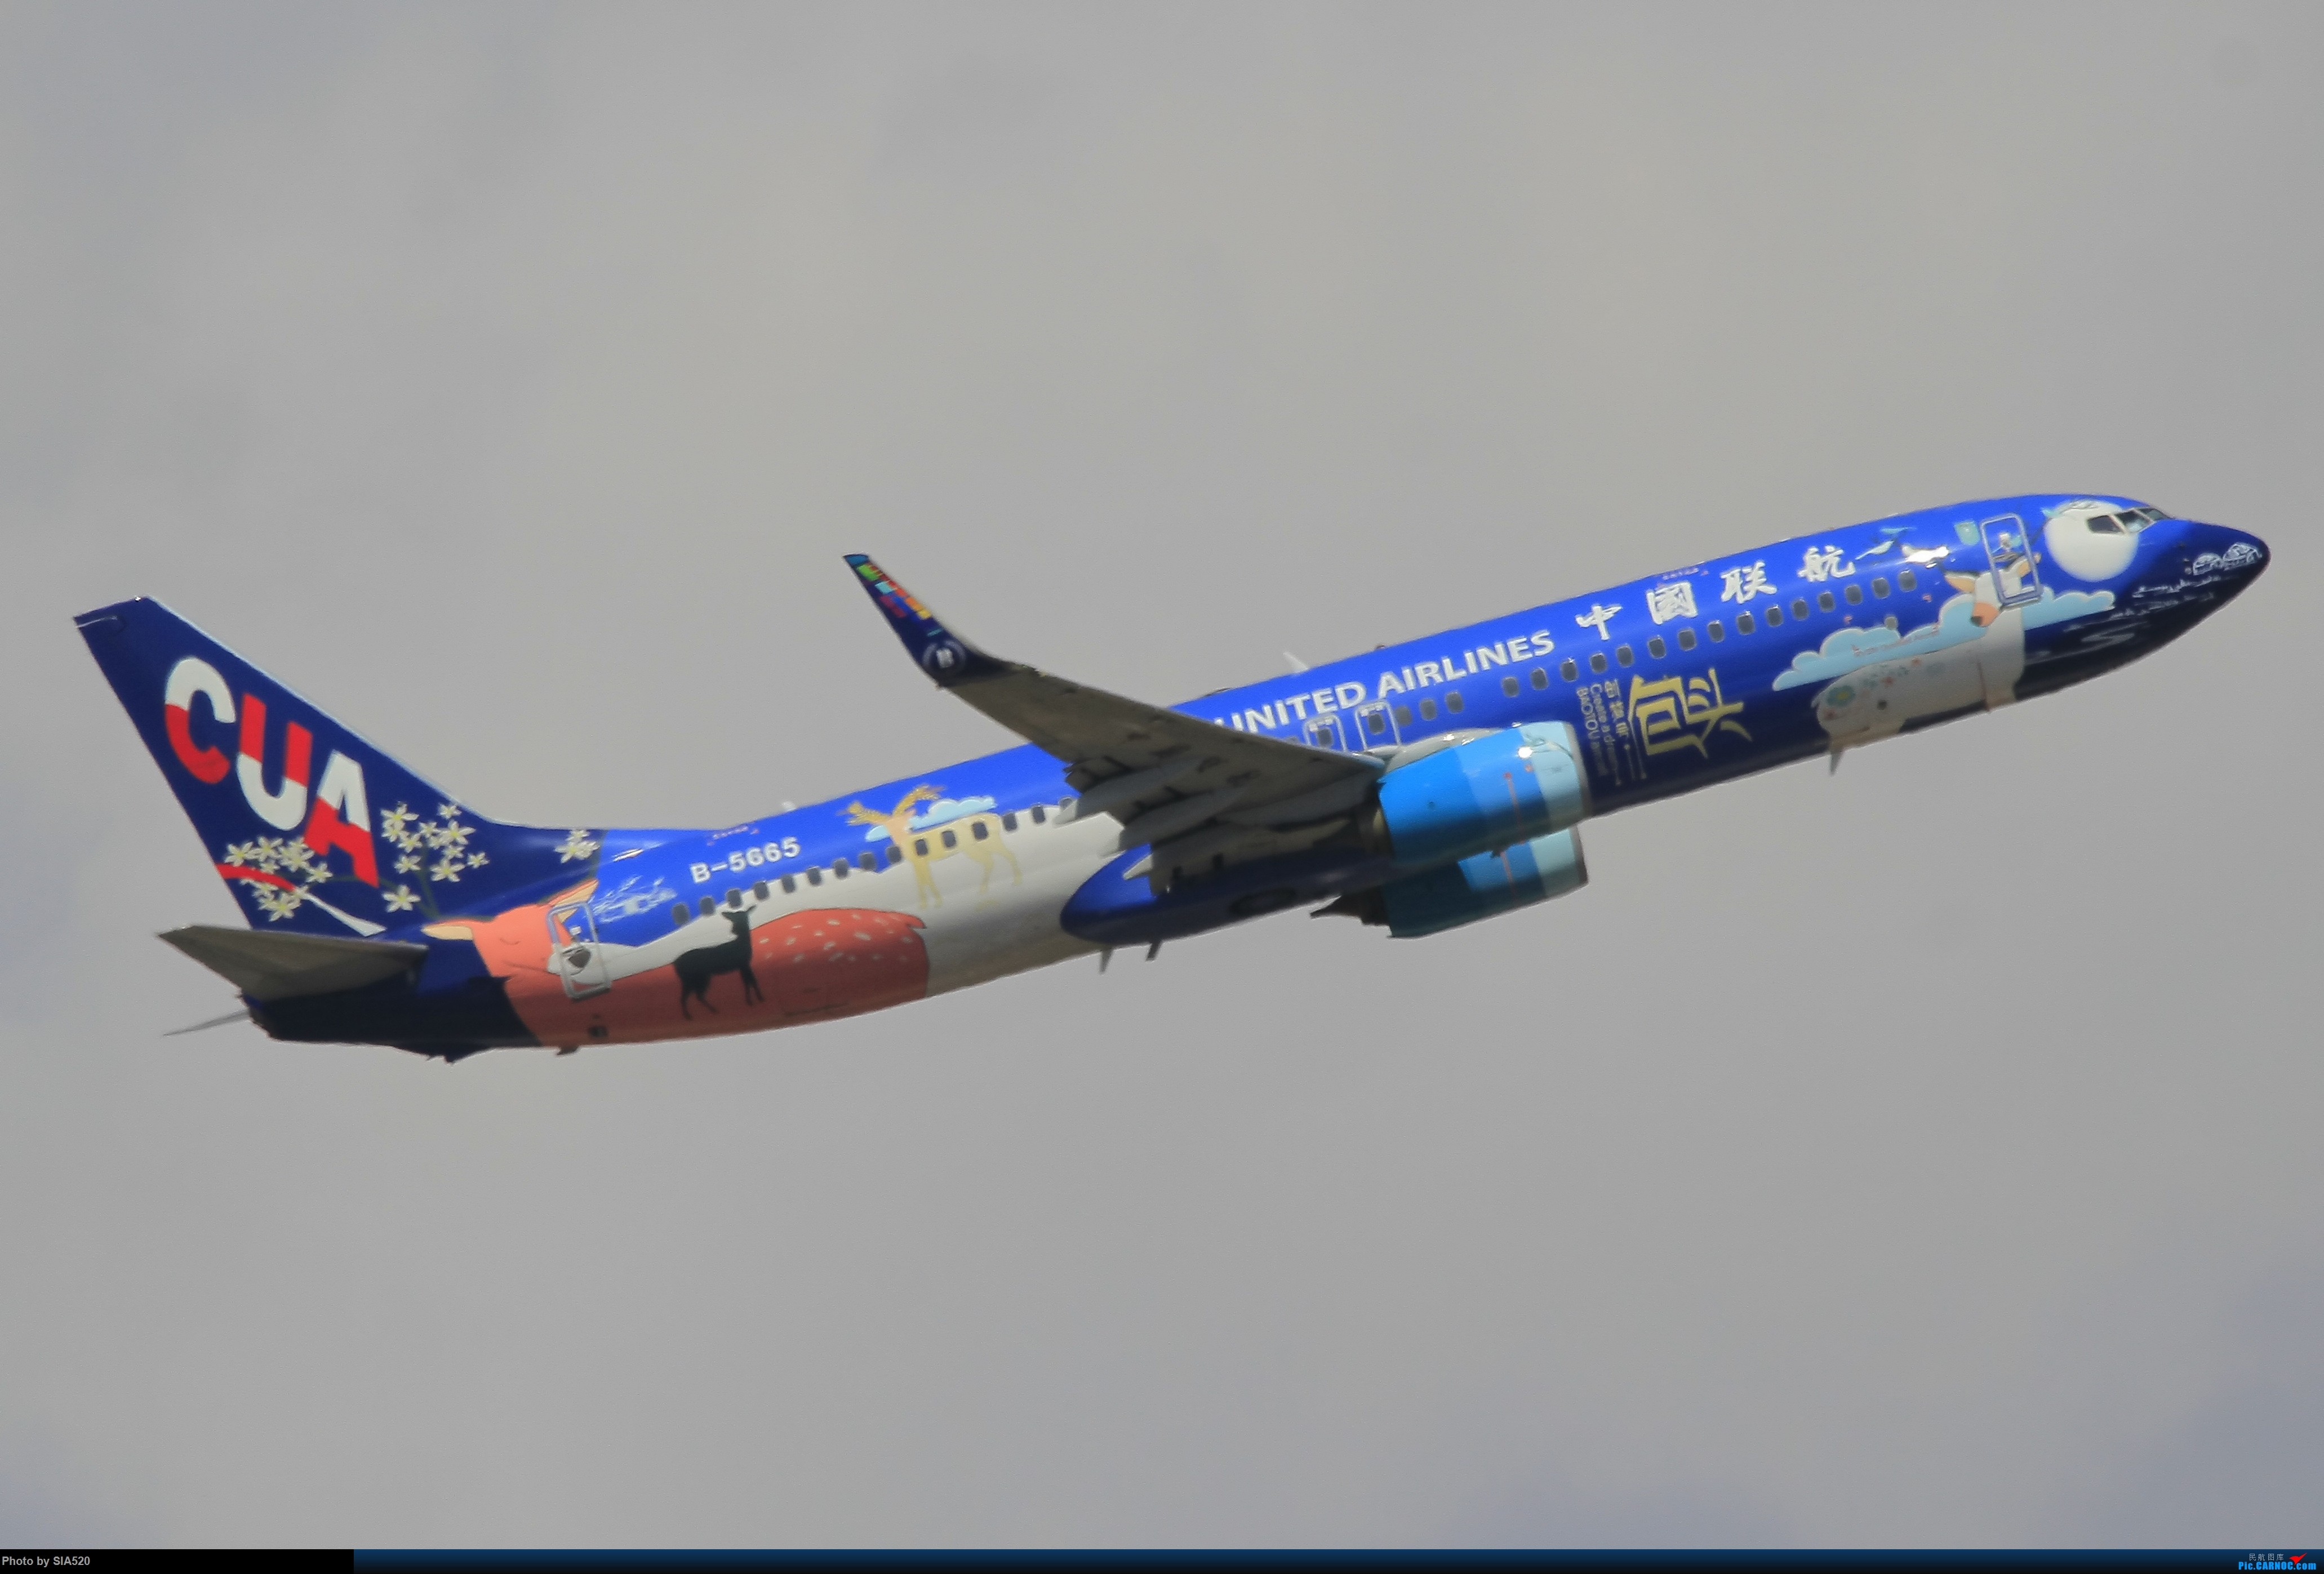 Re:[原创]北京人儿在三亚—600mm解锁凤凰 BOEING 737-800 B-5665 中国三亚凤凰国际机场